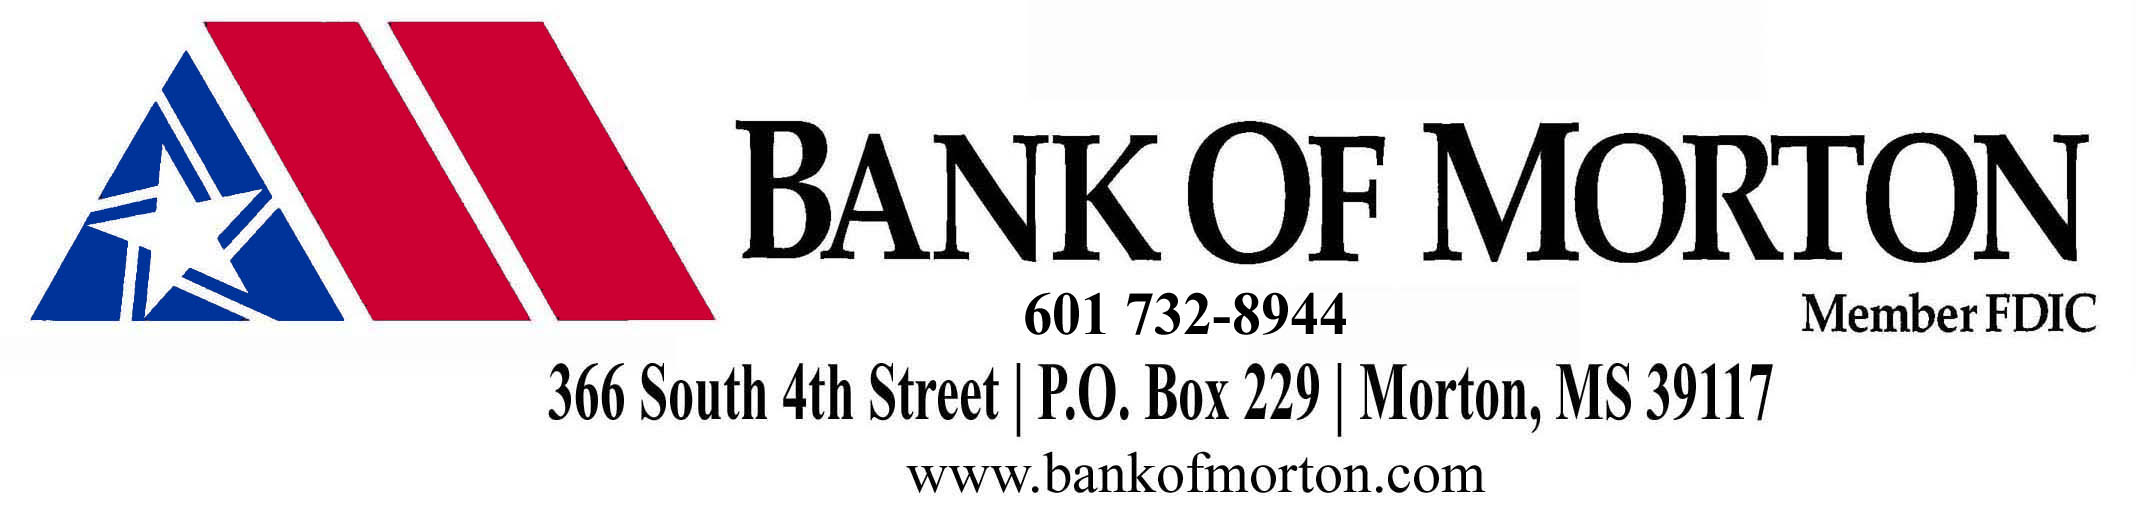 Bank Letterhead color telephone